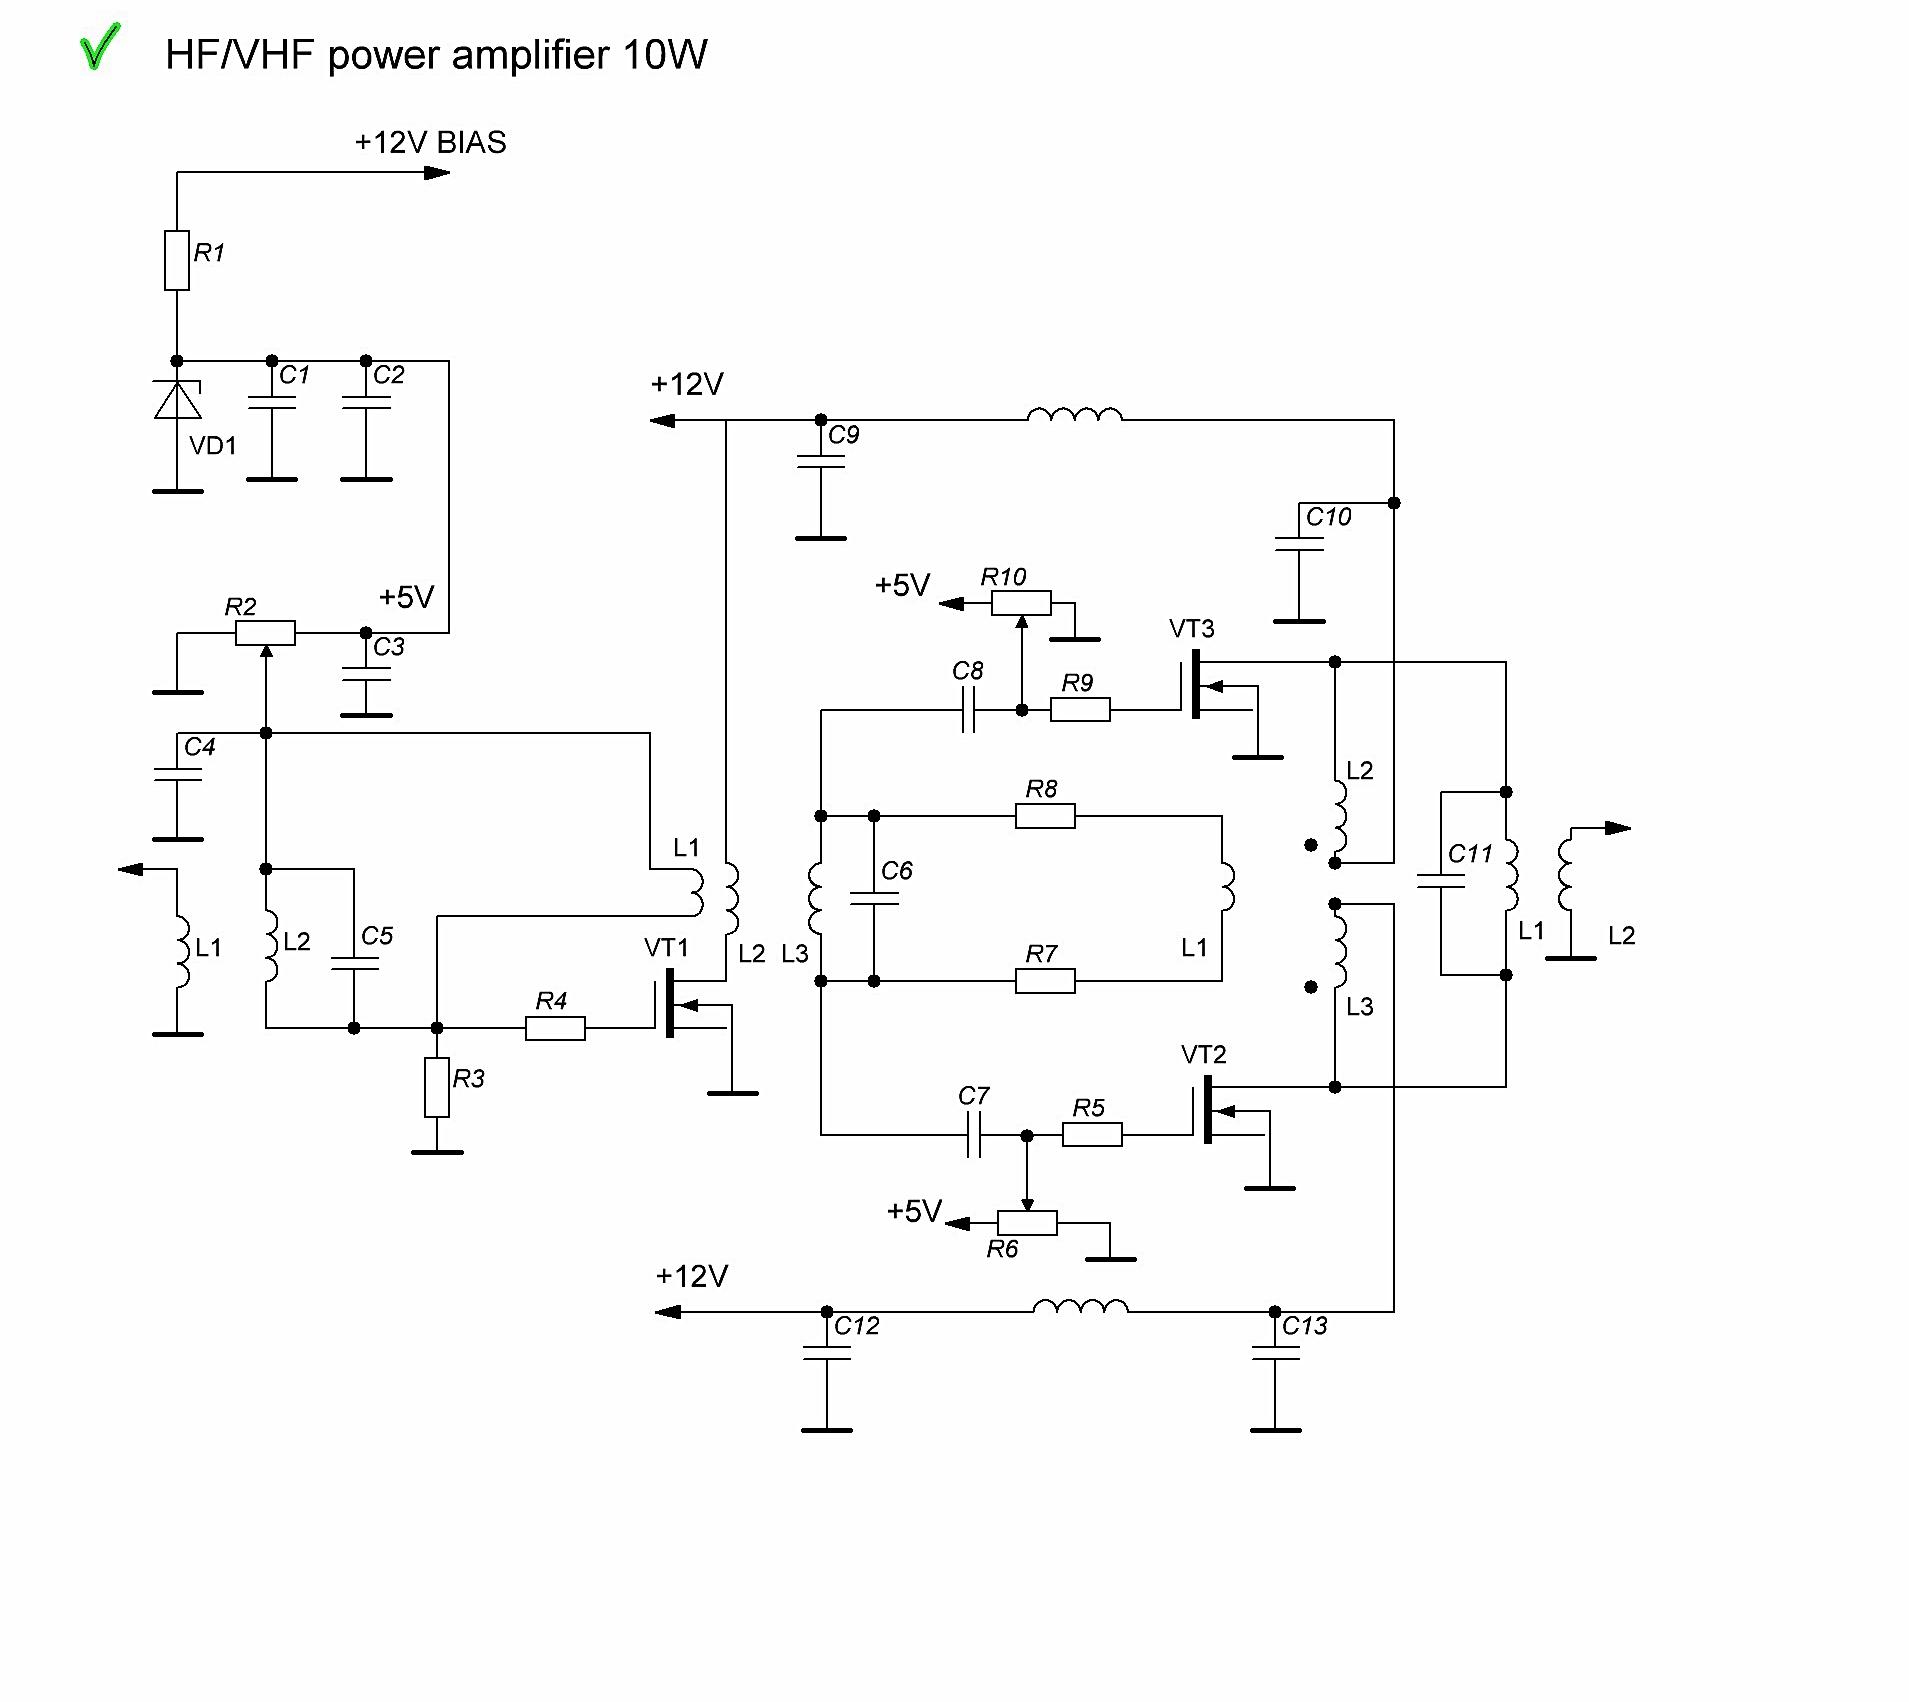 Ham HF 6m QRP PA 10W HF, 5W 2m board and 600W HF 6m version